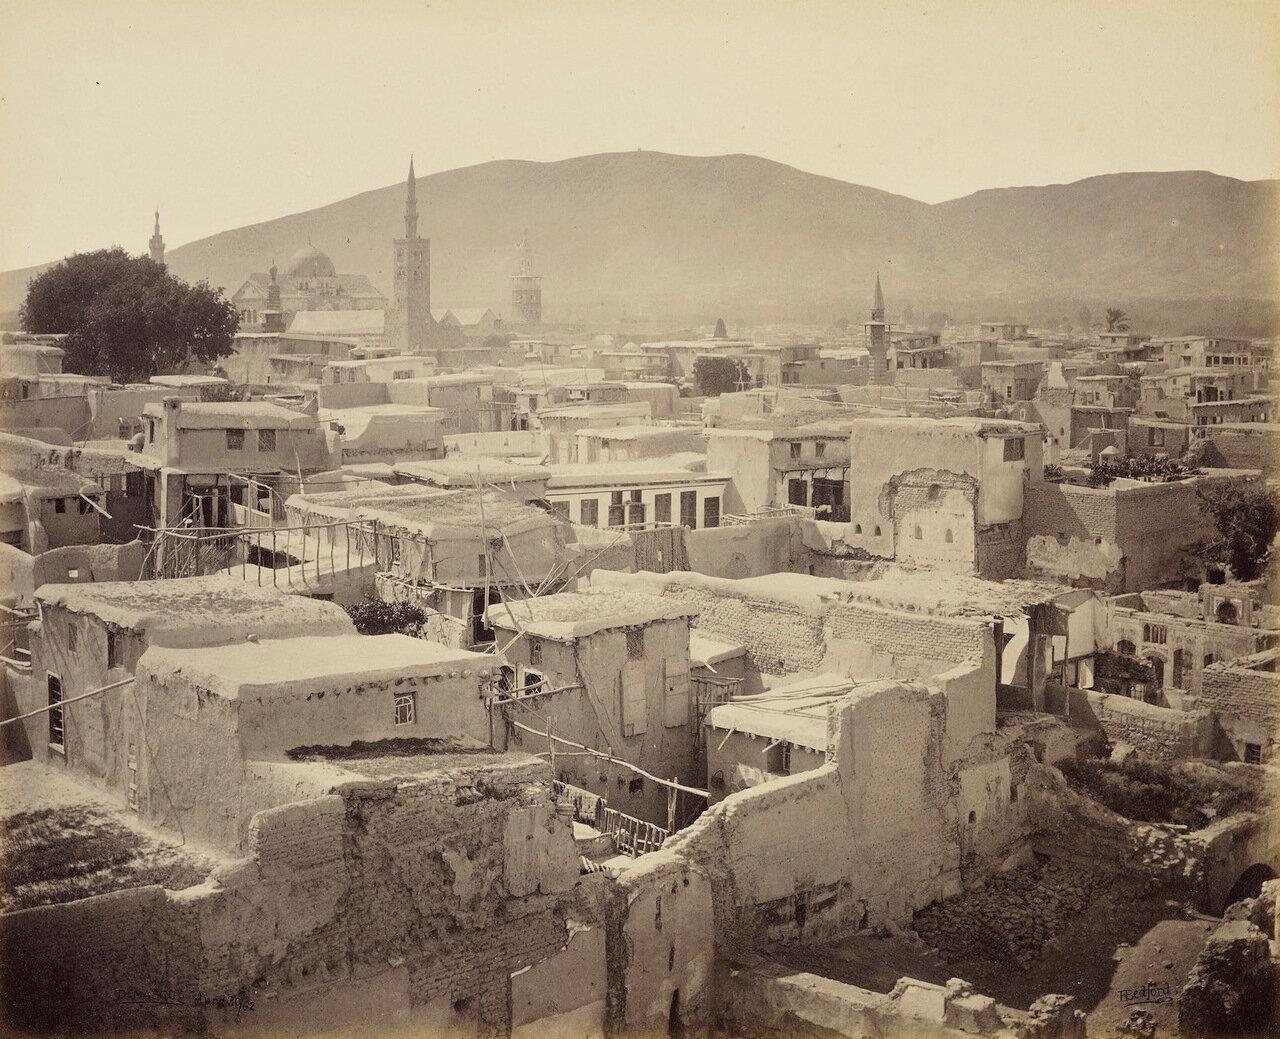 30 апреля 1862. Дамаск. Панорама с минарета в христианском квартале